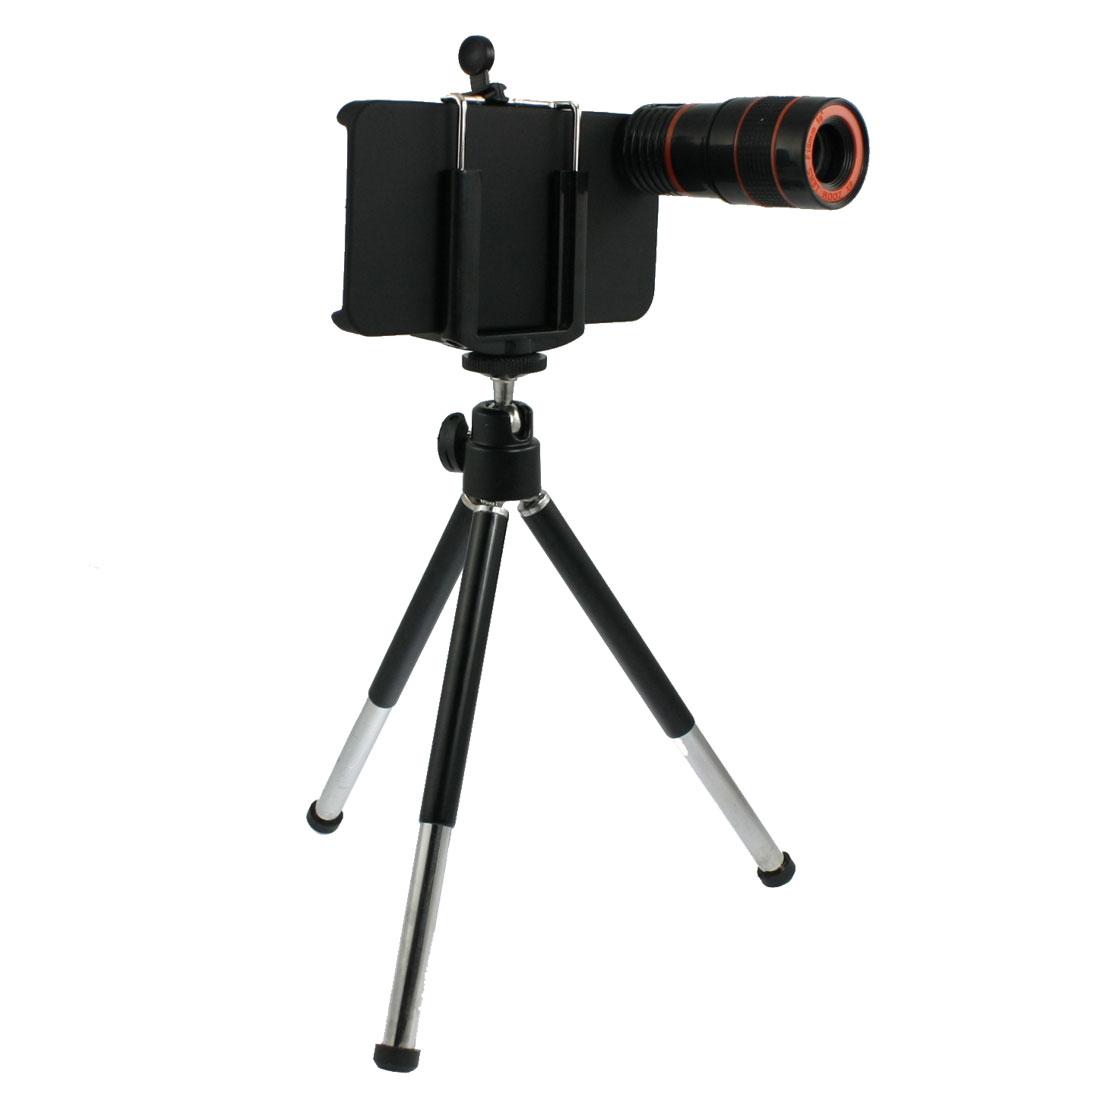 8X Zoom Telescope Camera Lens w Mini Tripod Holder Back Case for Apple iPhone 4 4G